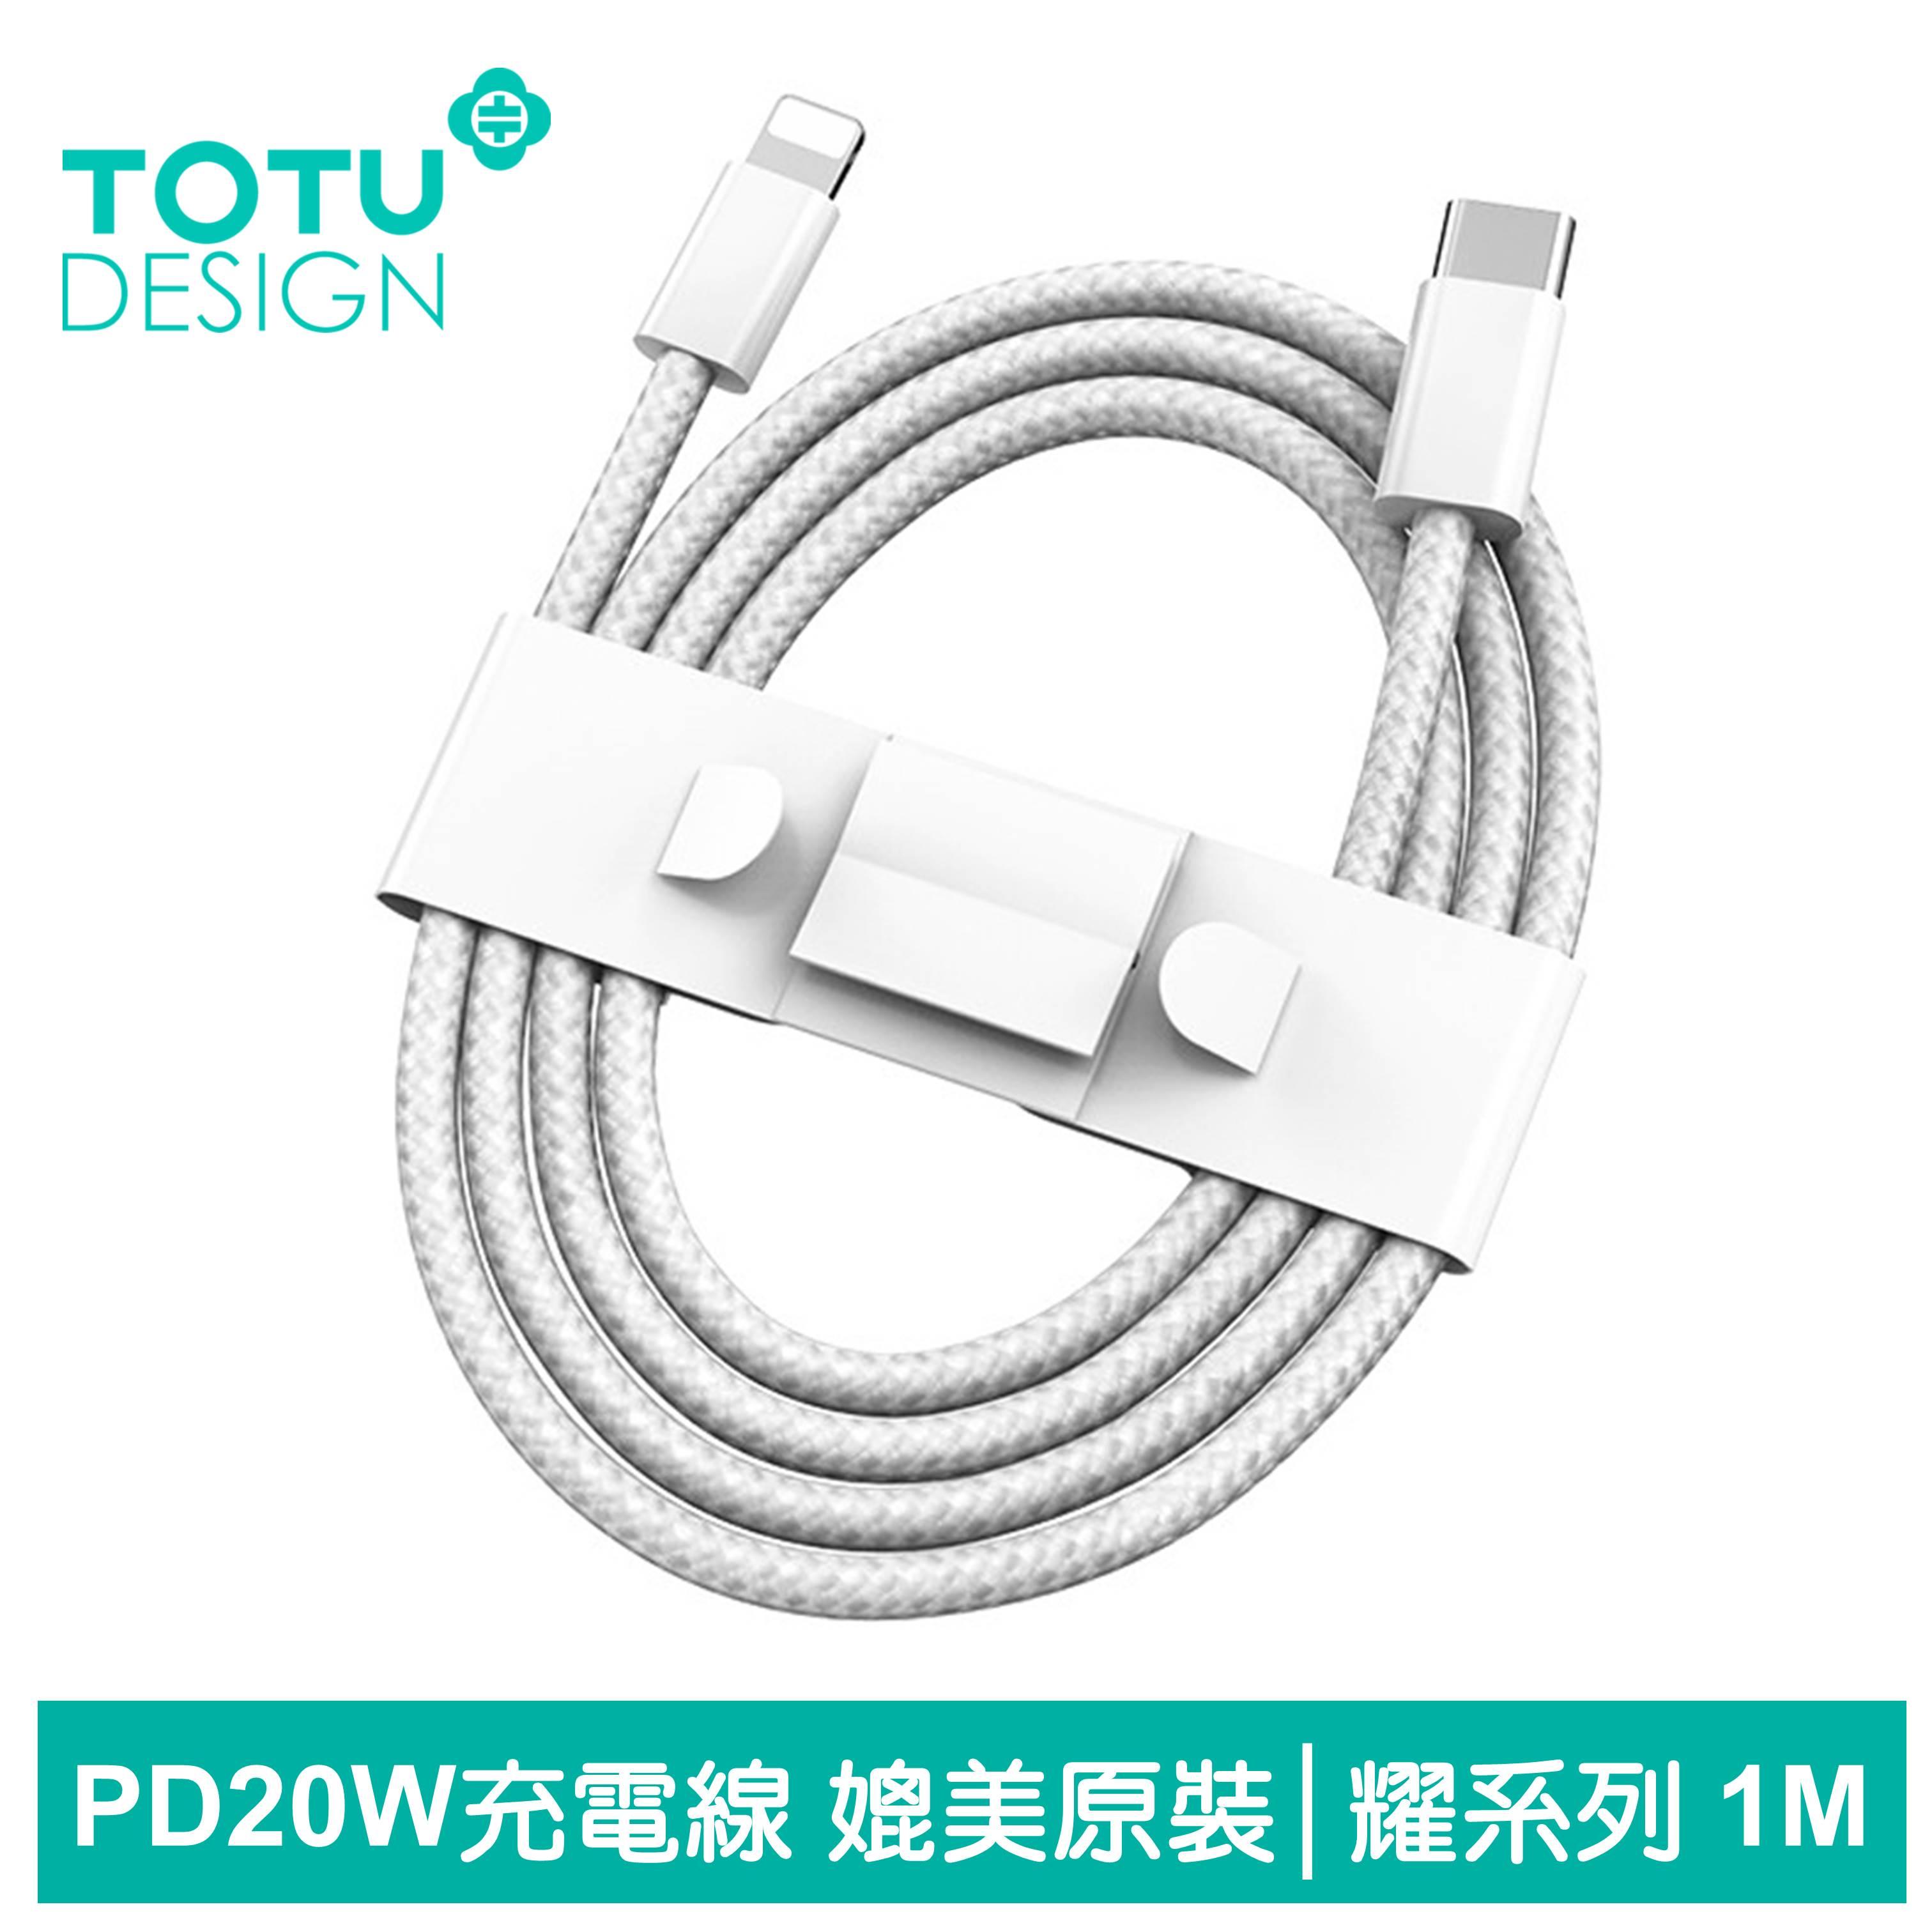 TOTU台灣官方 PD/Lightning/Type-C/iPhone充電線傳輸線編織快充線 20W 媲美原裝 耀系列 1M 白色